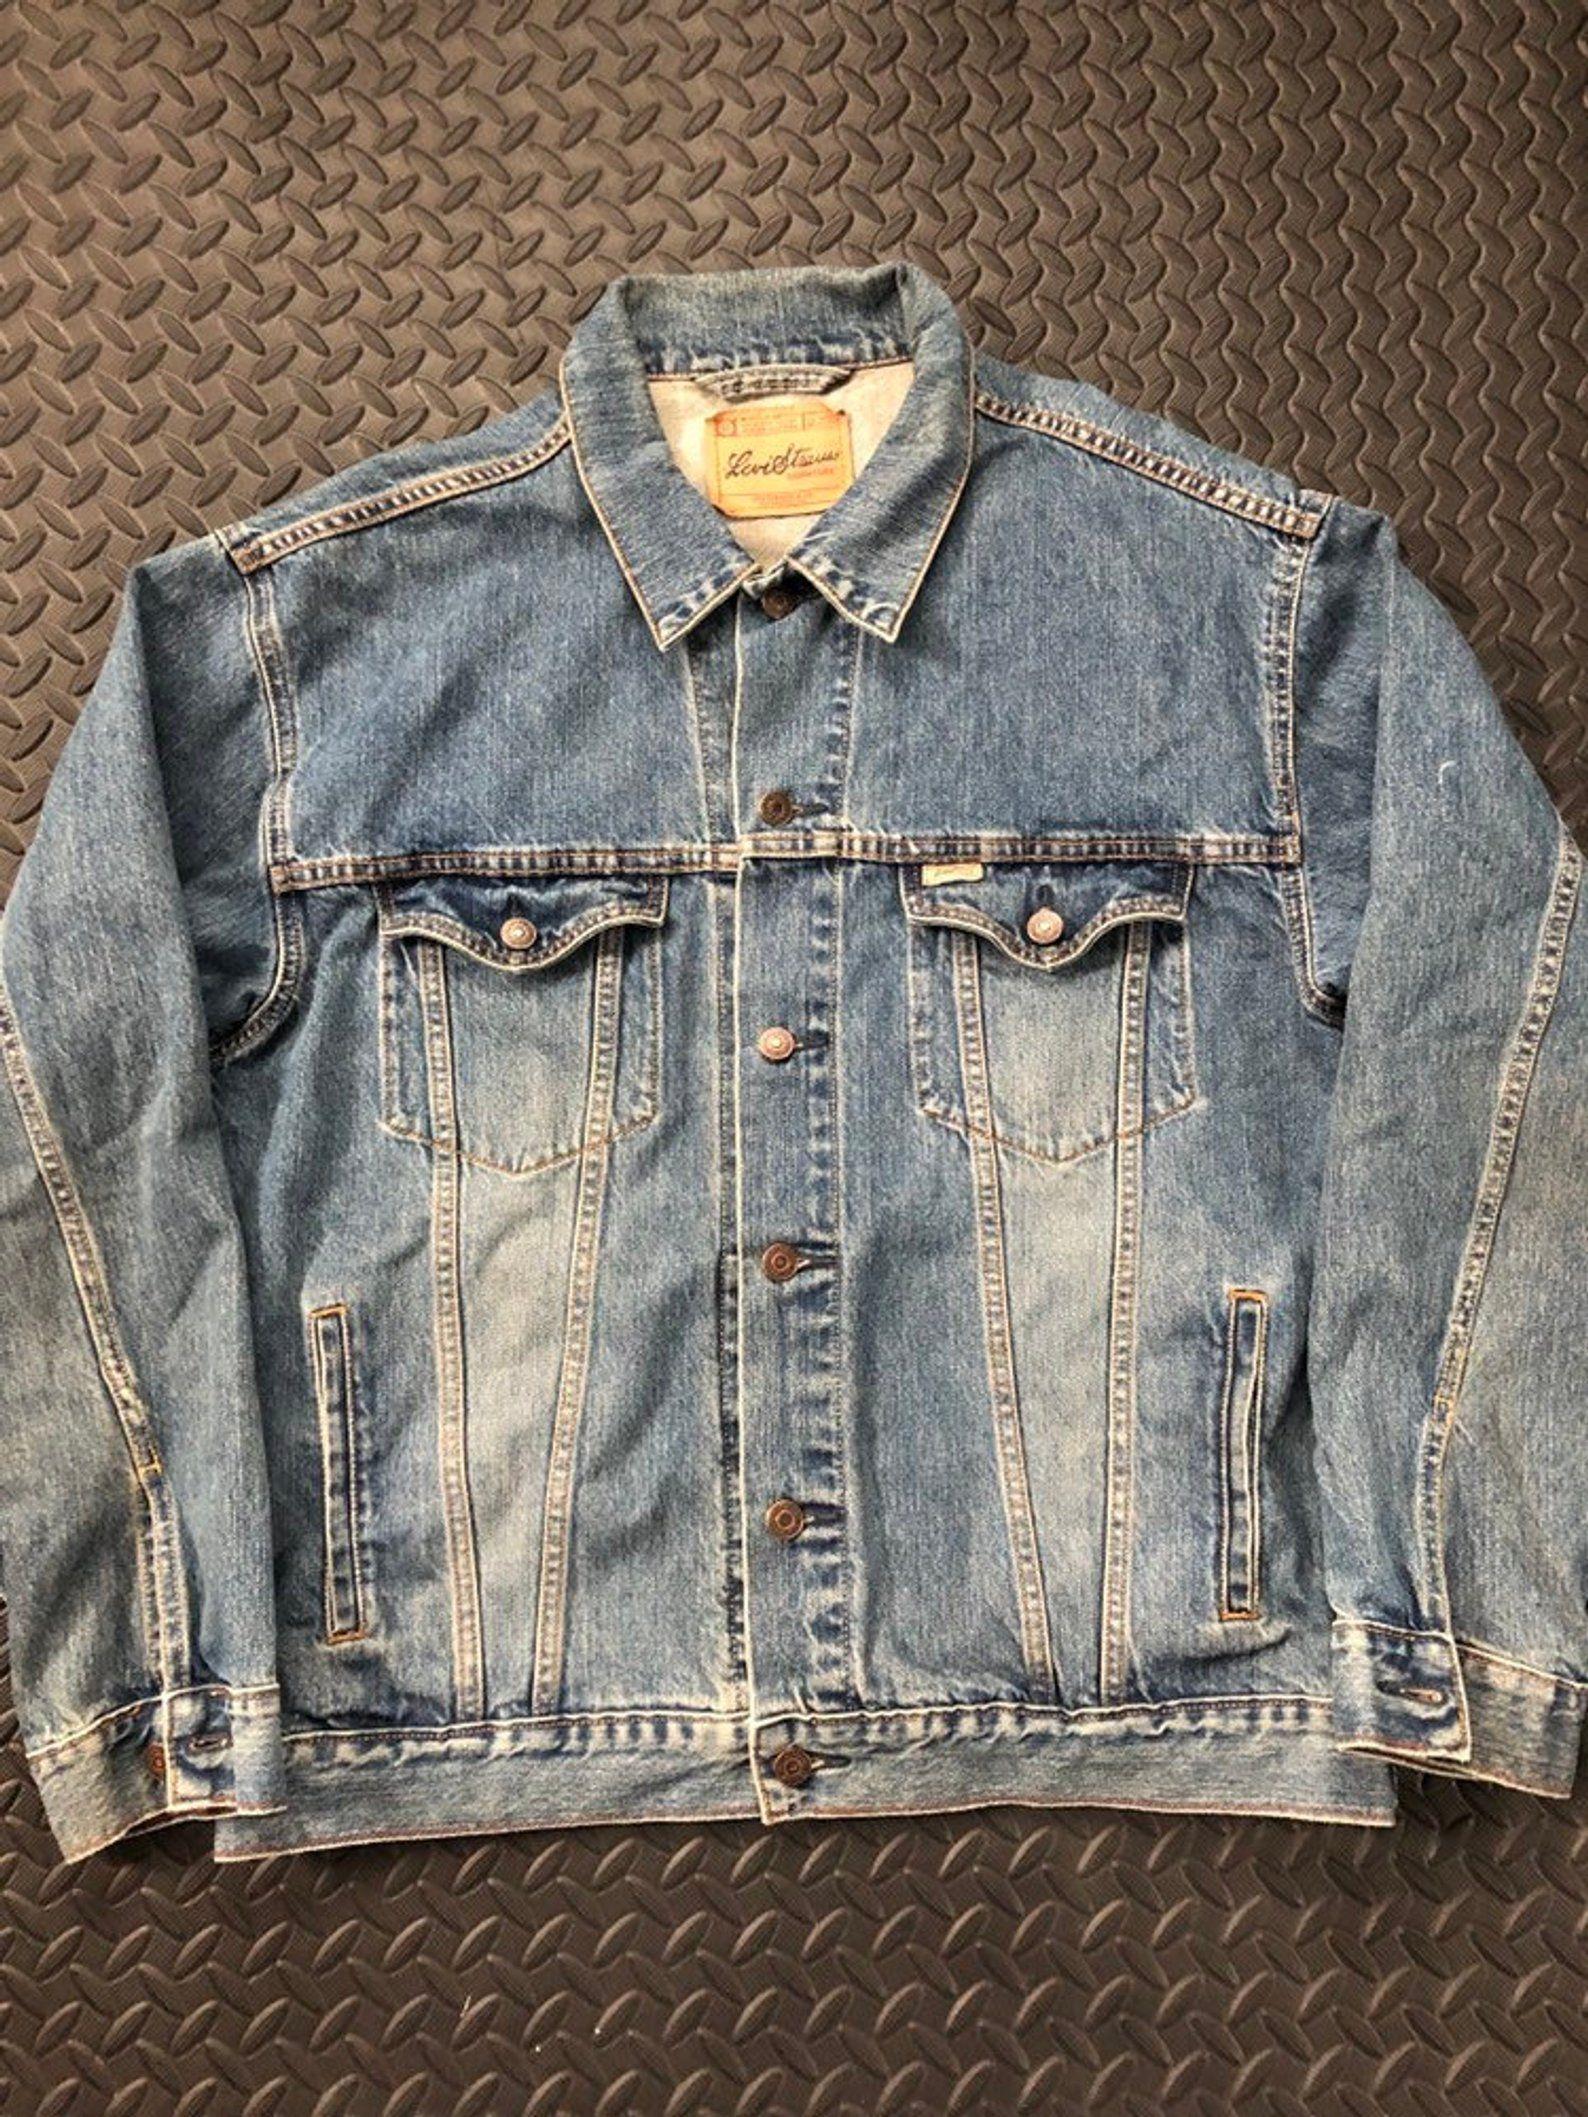 Vintage 90s Levis Strauss Denim Jacket Etsy Denim Jacket Jackets Levi Strauss